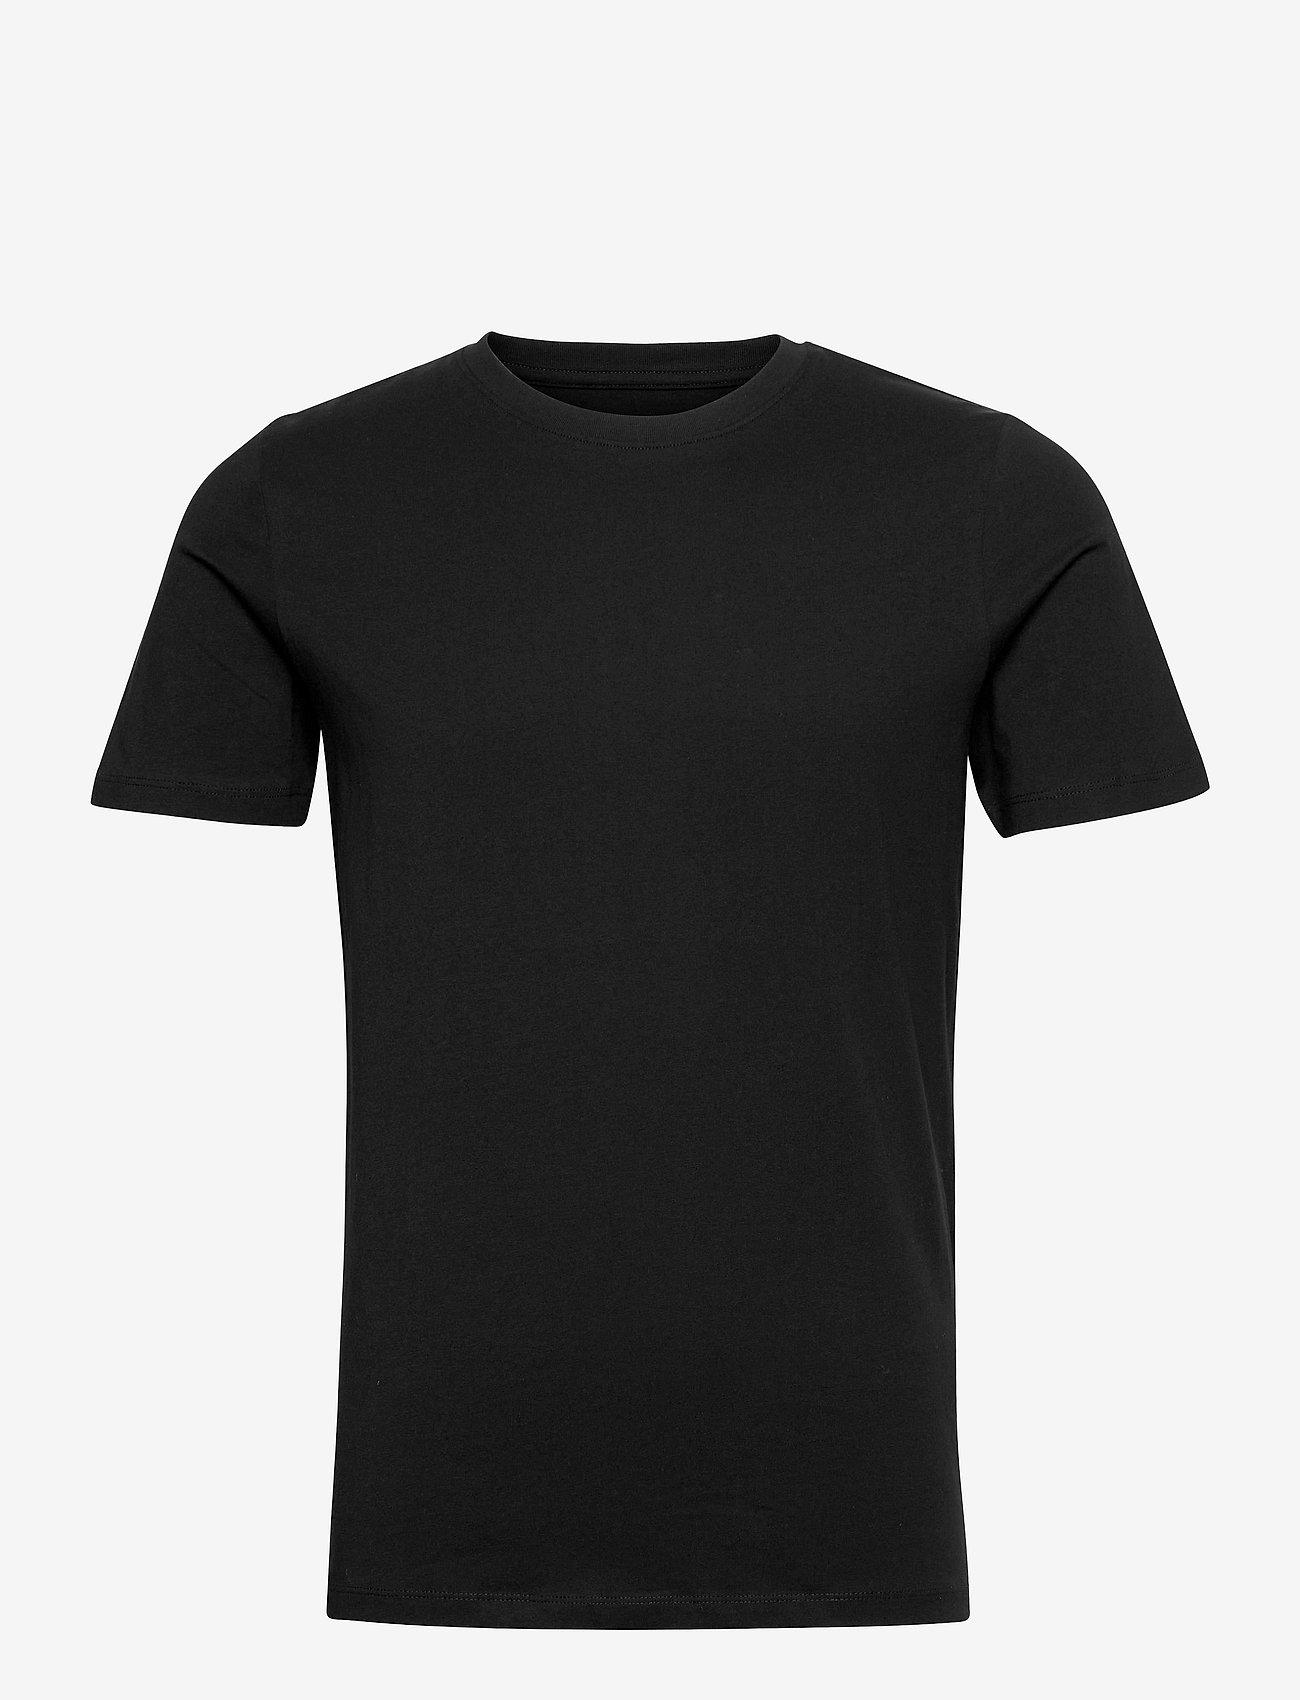 Jack & Jones - JJEORGANIC BASIC TEE SS O-NECK - basic t-shirts - black - 0